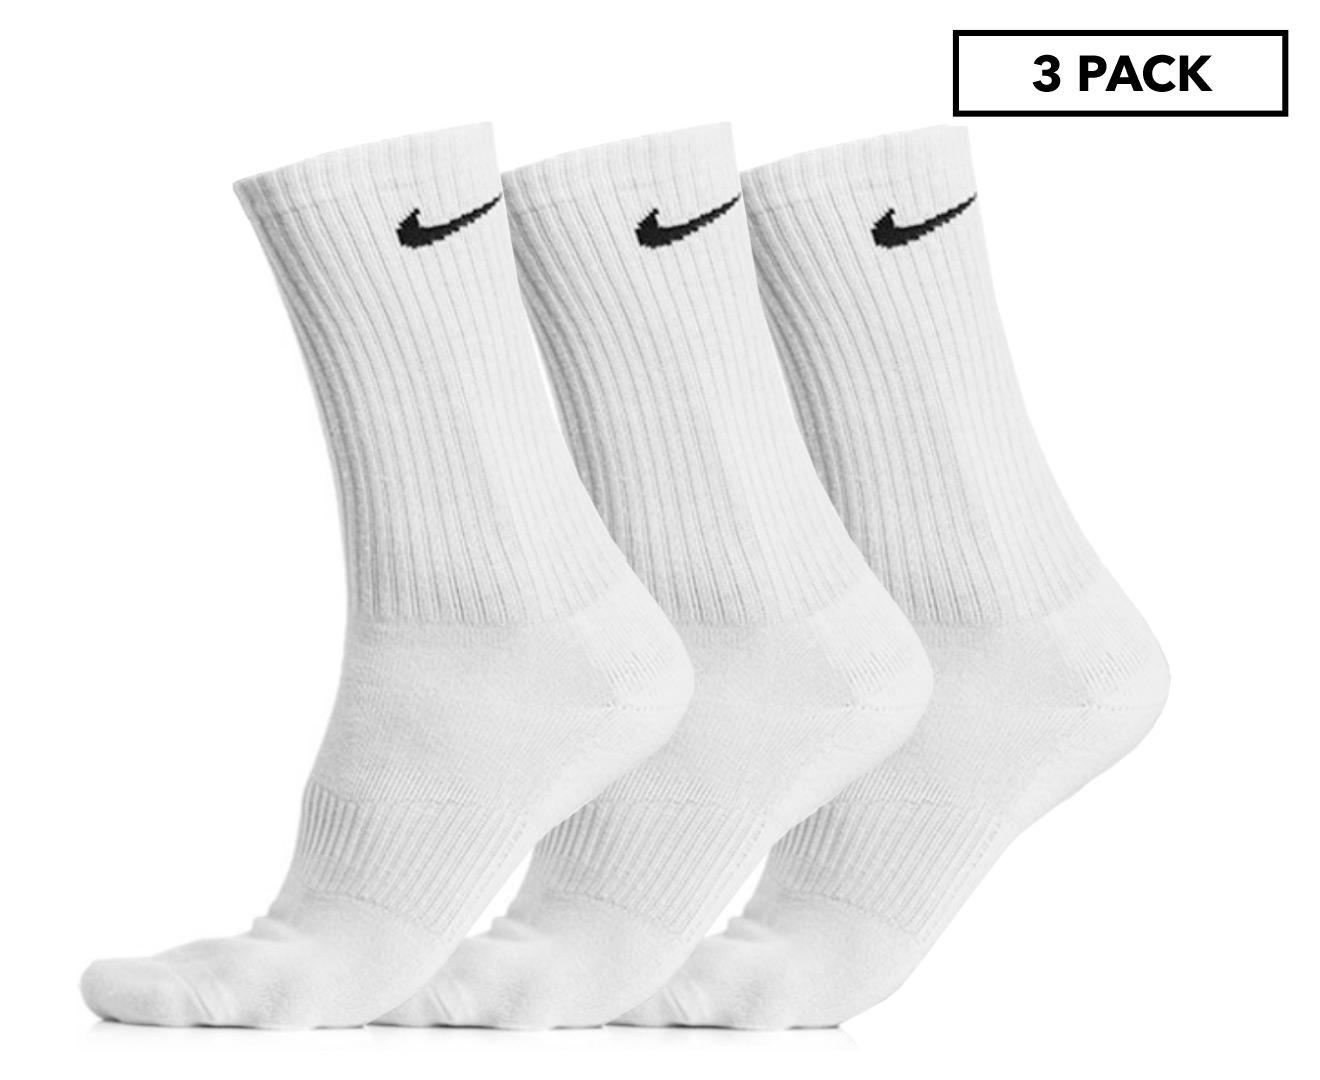 72a68892e Nike Men's Cotton Cushion Crew Socks 3 Pack - White | eBay